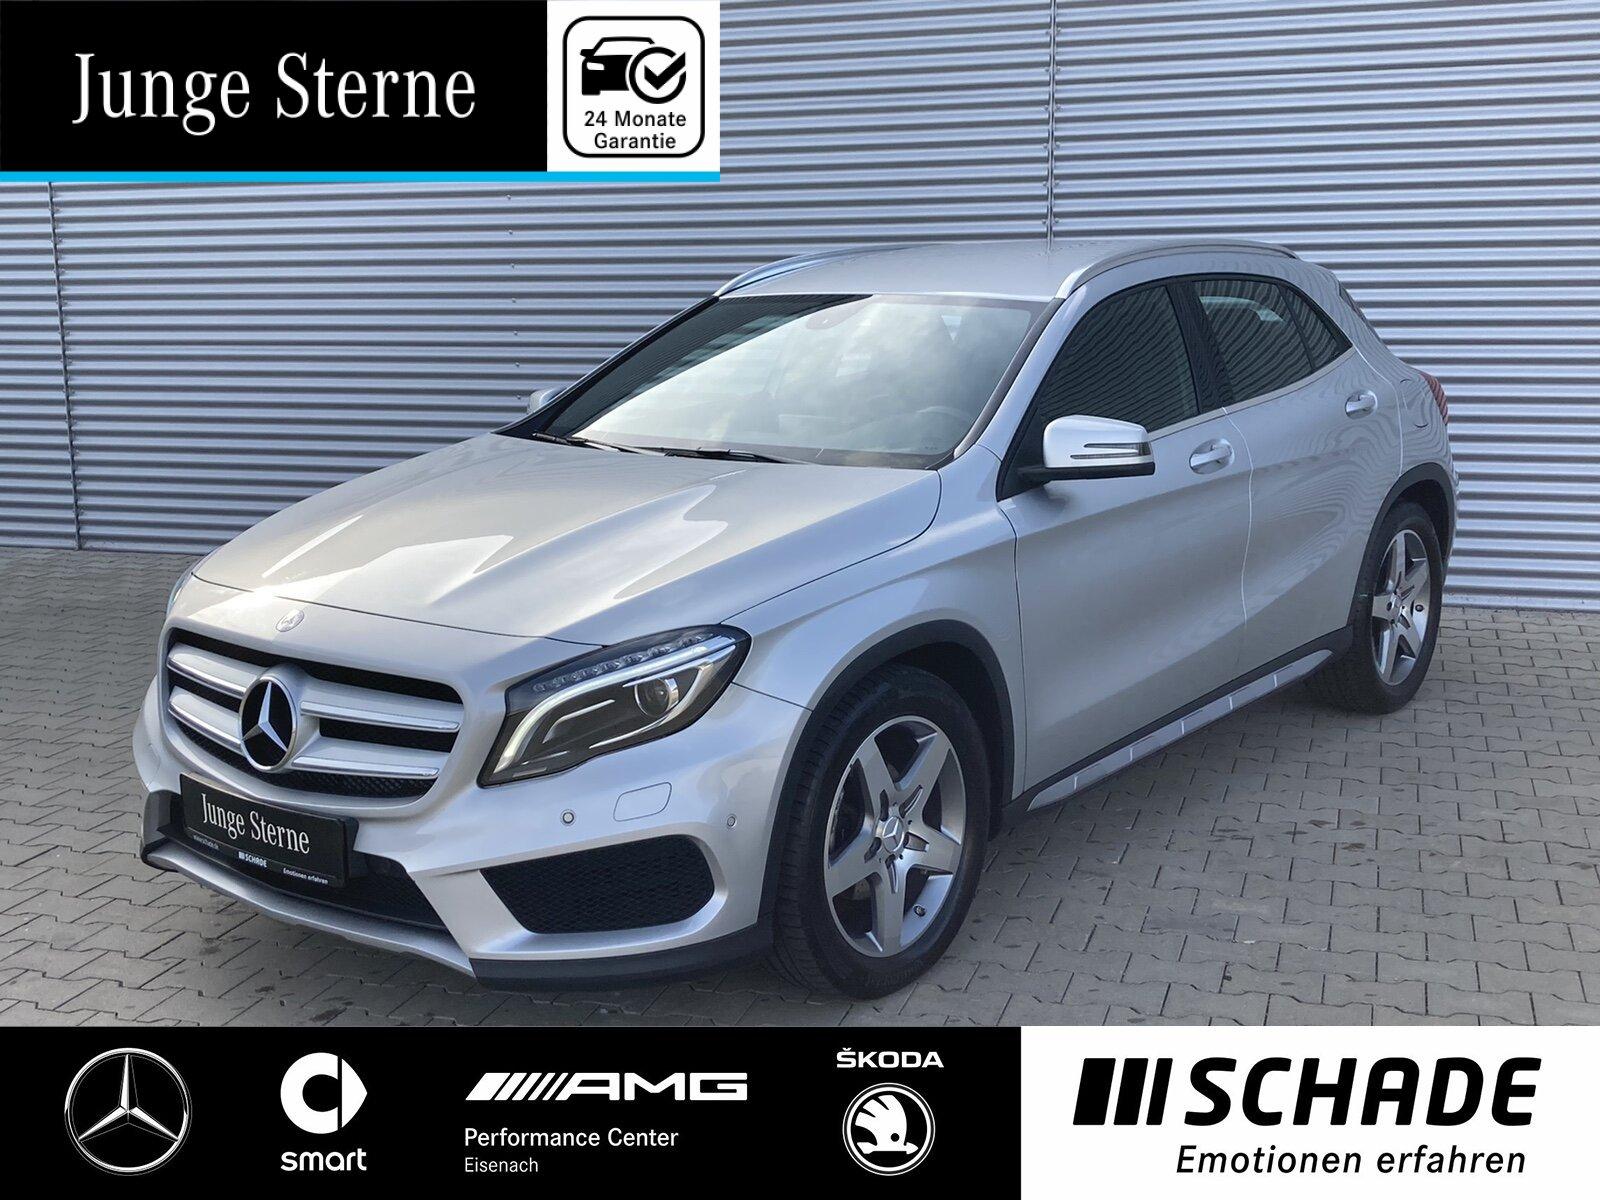 Mercedes-Benz GLA 200 AMG Line *Navi*Xenon*Kamera*Street Style, Jahr 2015, Benzin